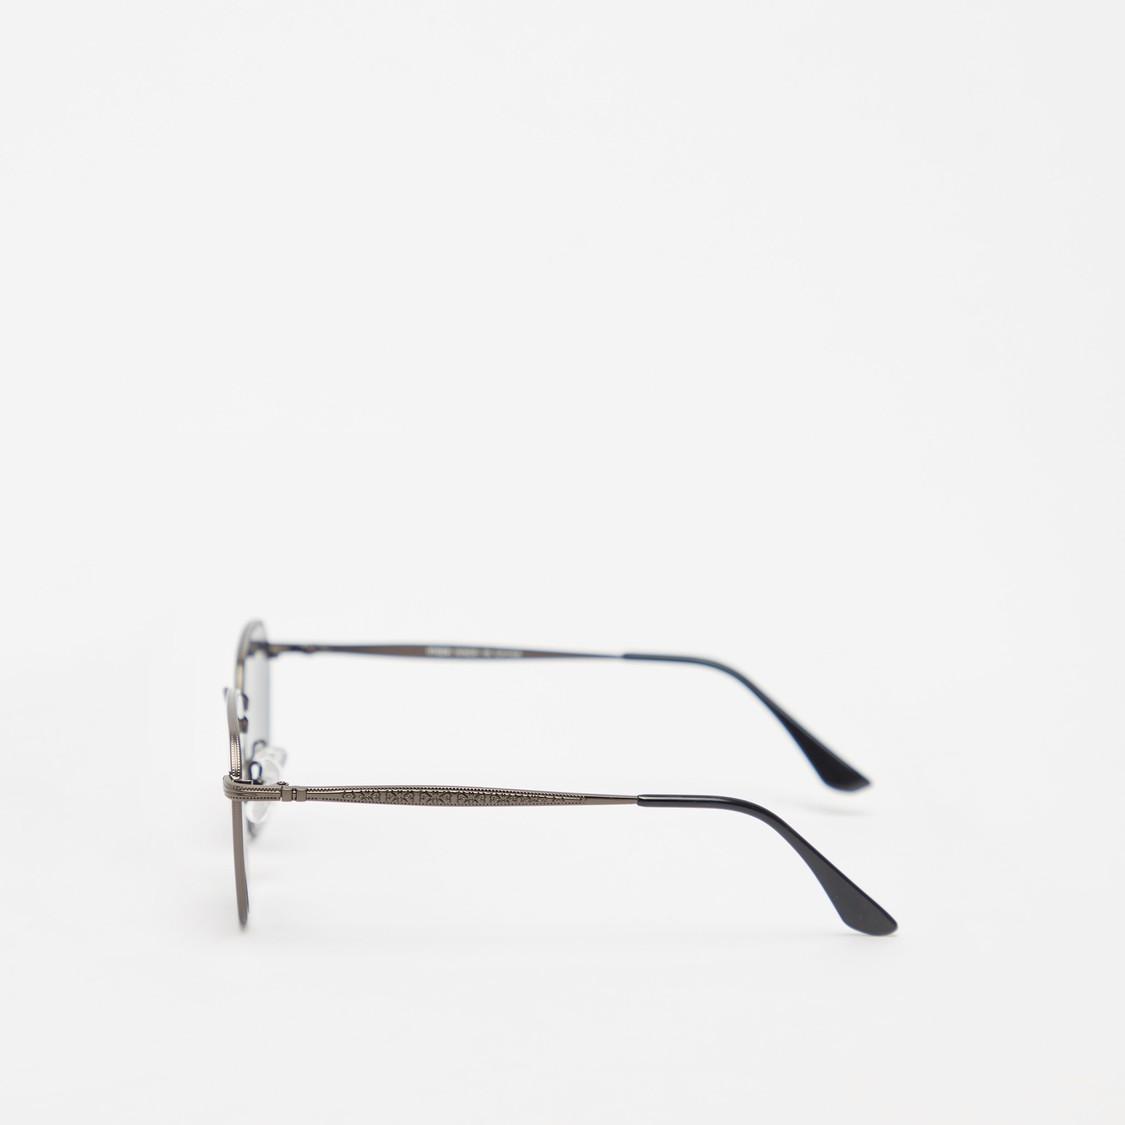 Full Rim Square Sunglasses with Nose Pads